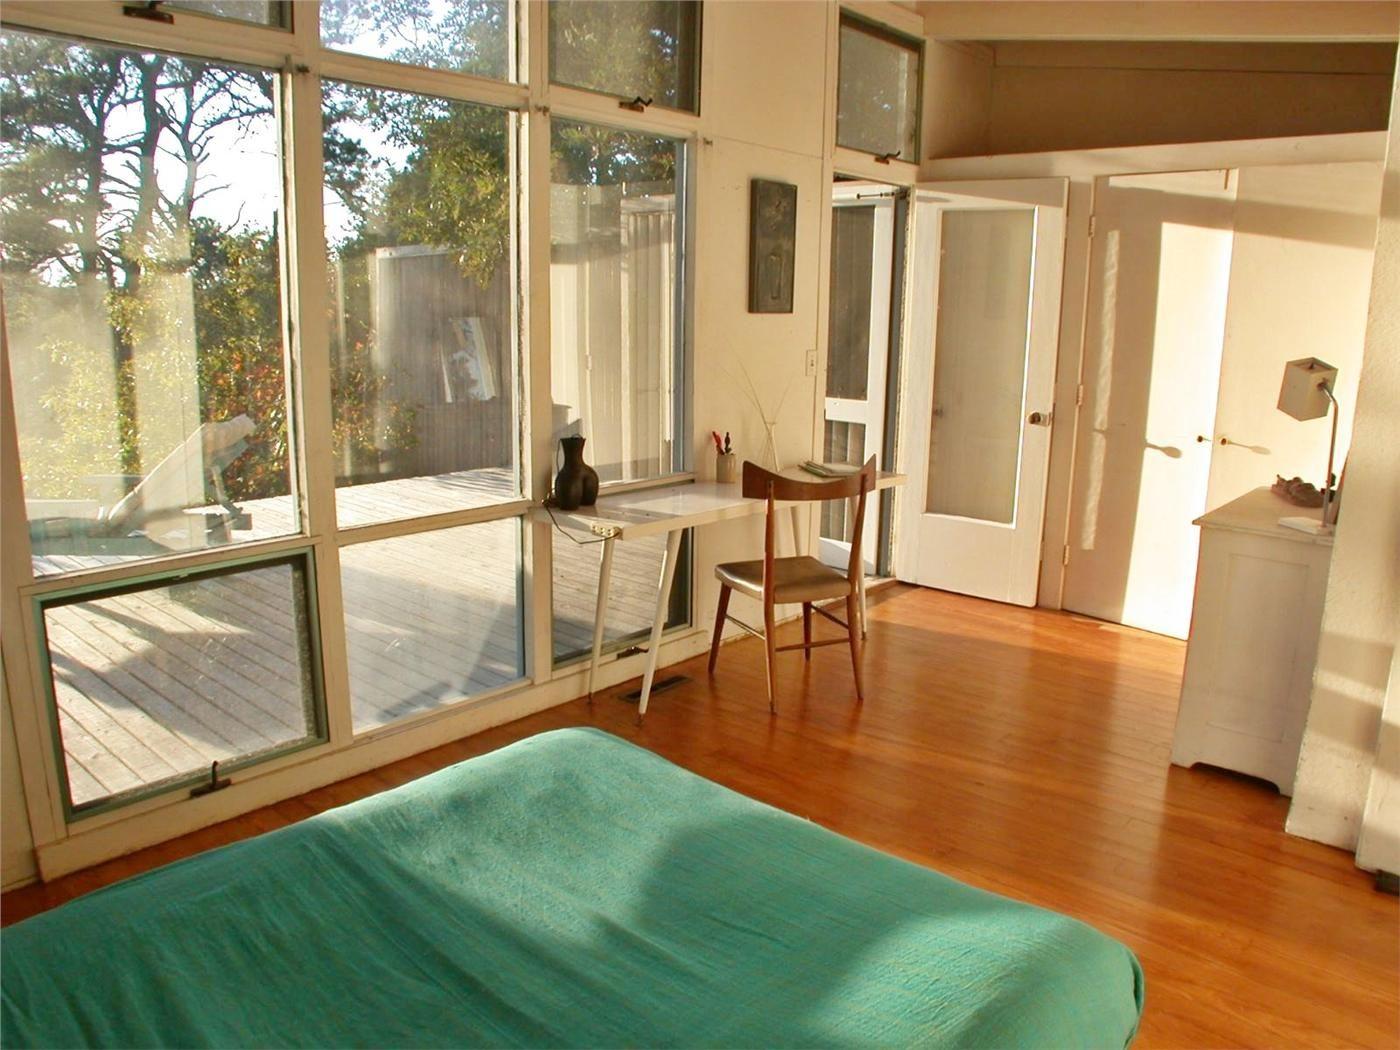 Wellfleet Vacation Rental home in Cape Cod MA, half mile